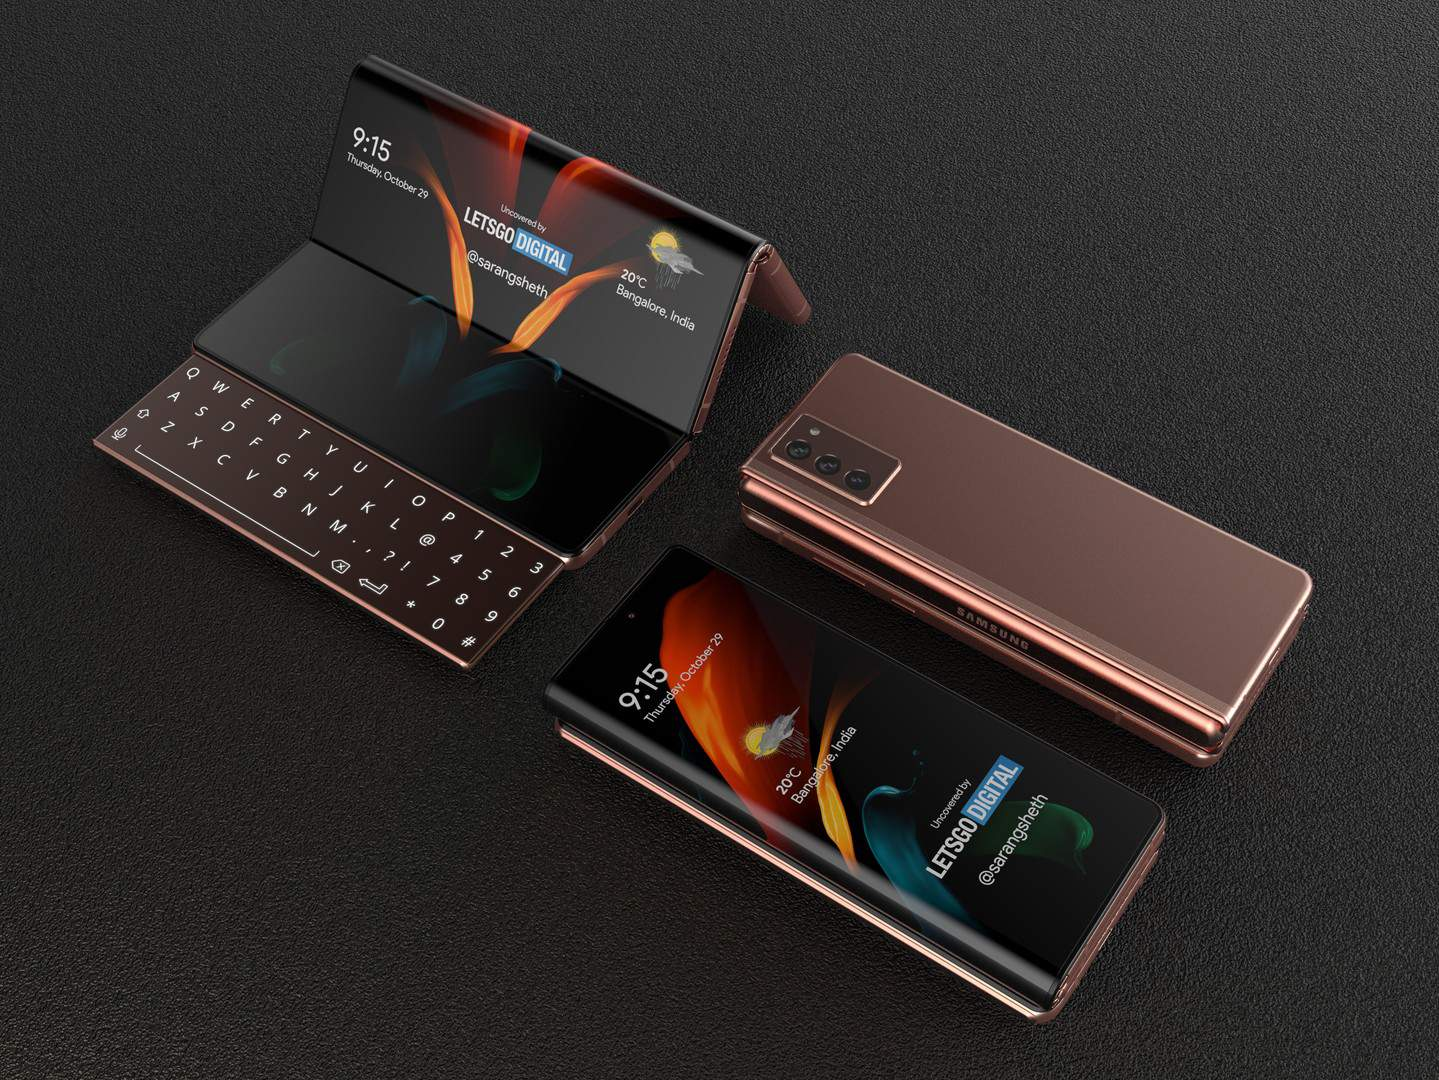 Samsung Galaxy Z Fold with sliding keyboard 2